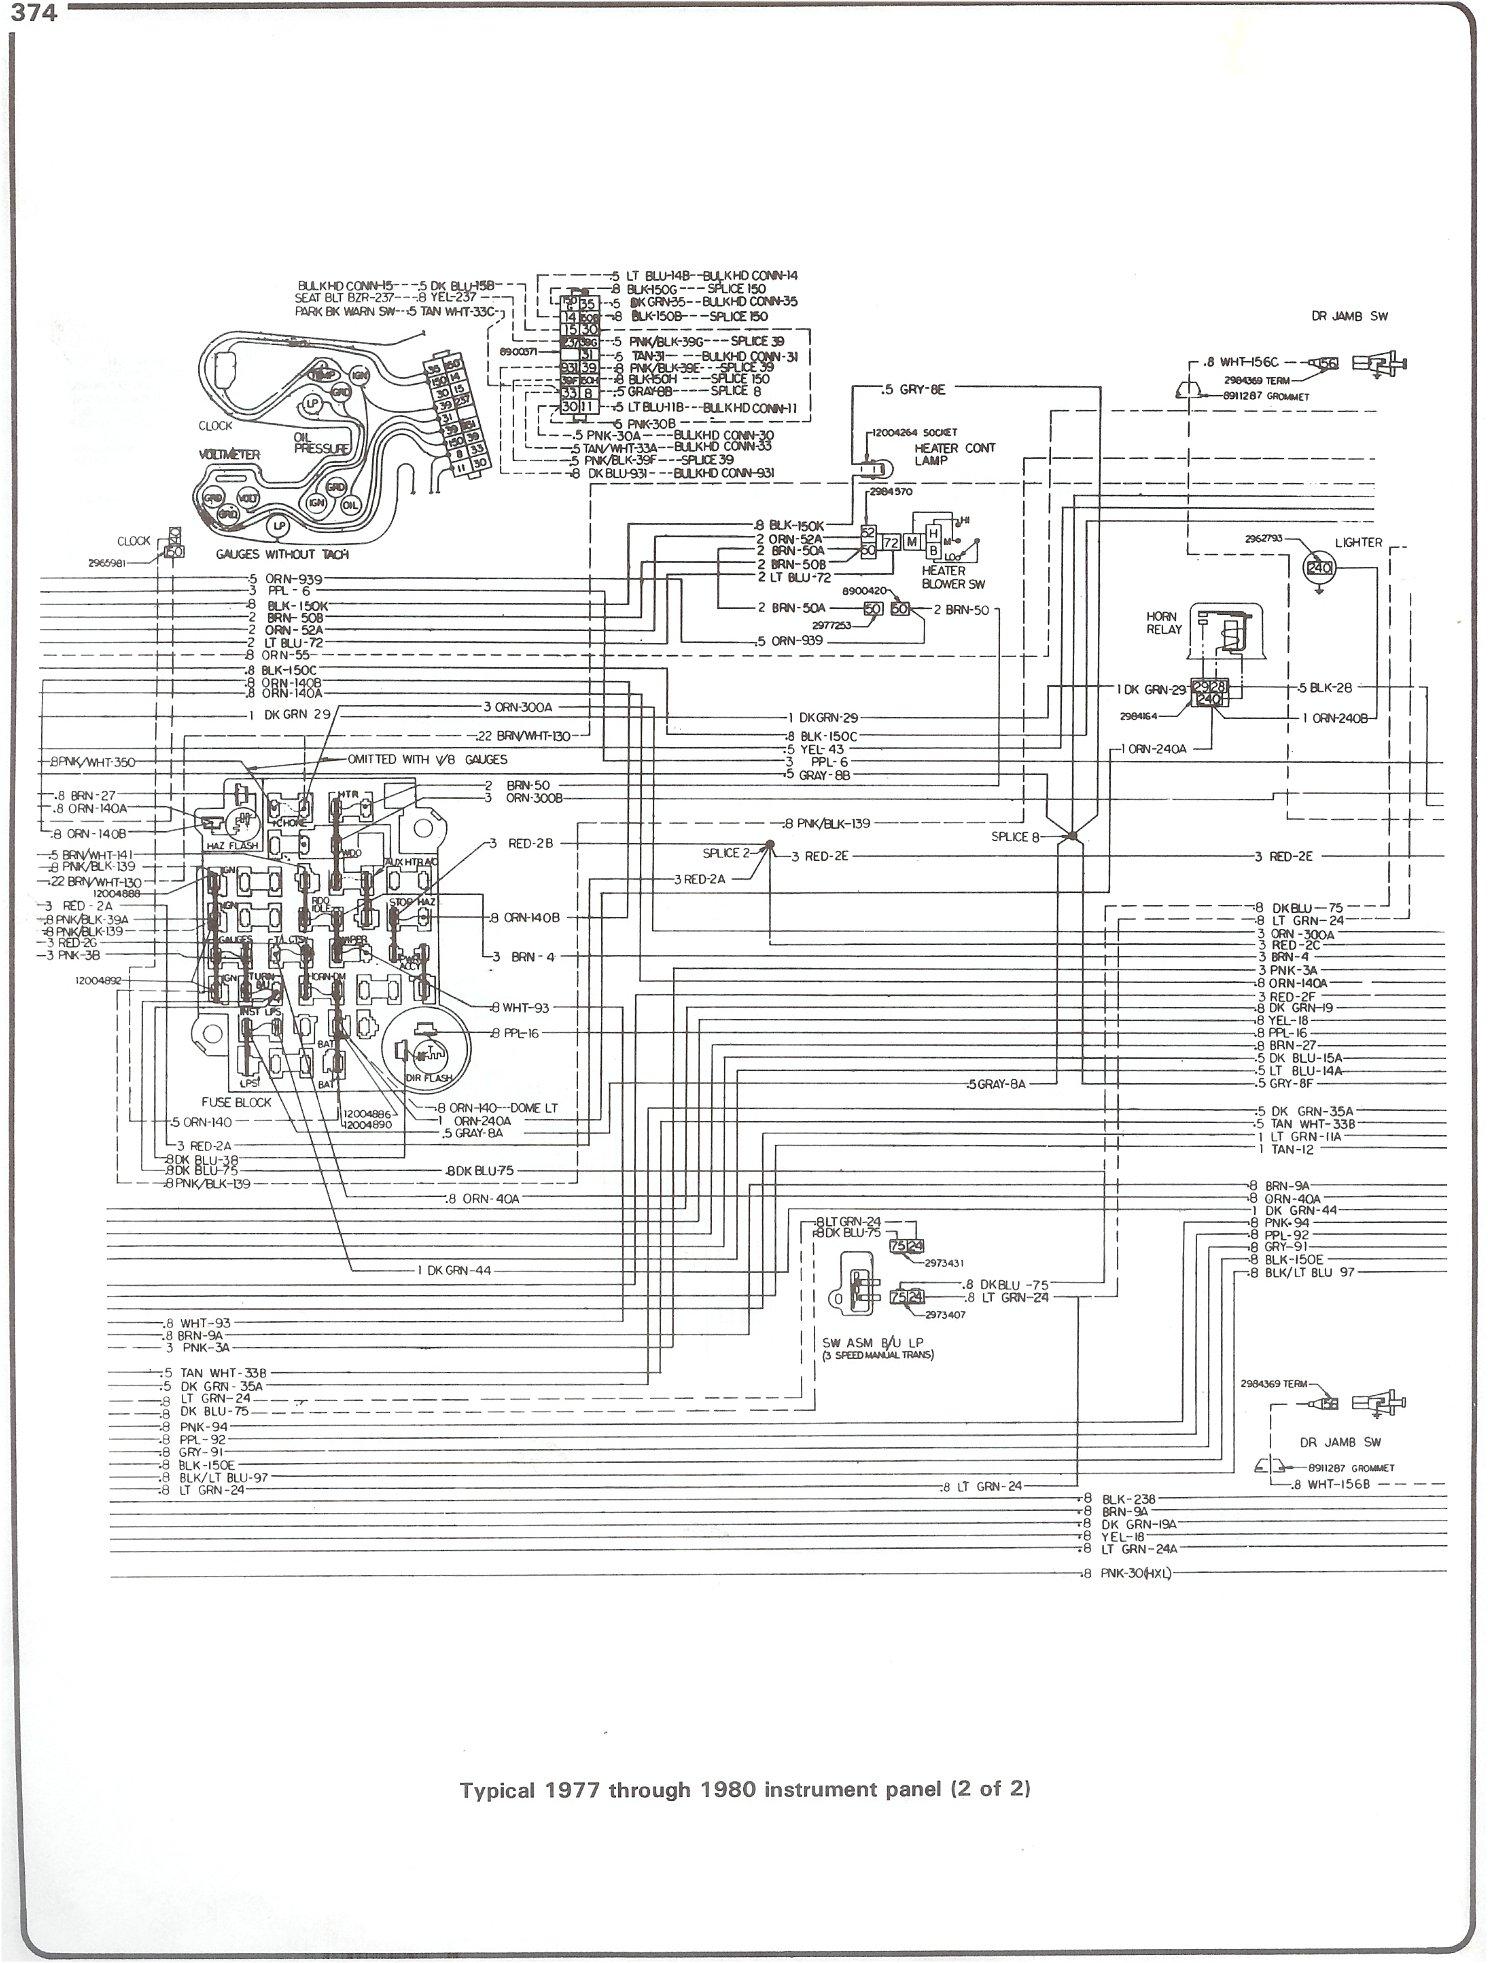 73 gmc wiring harness